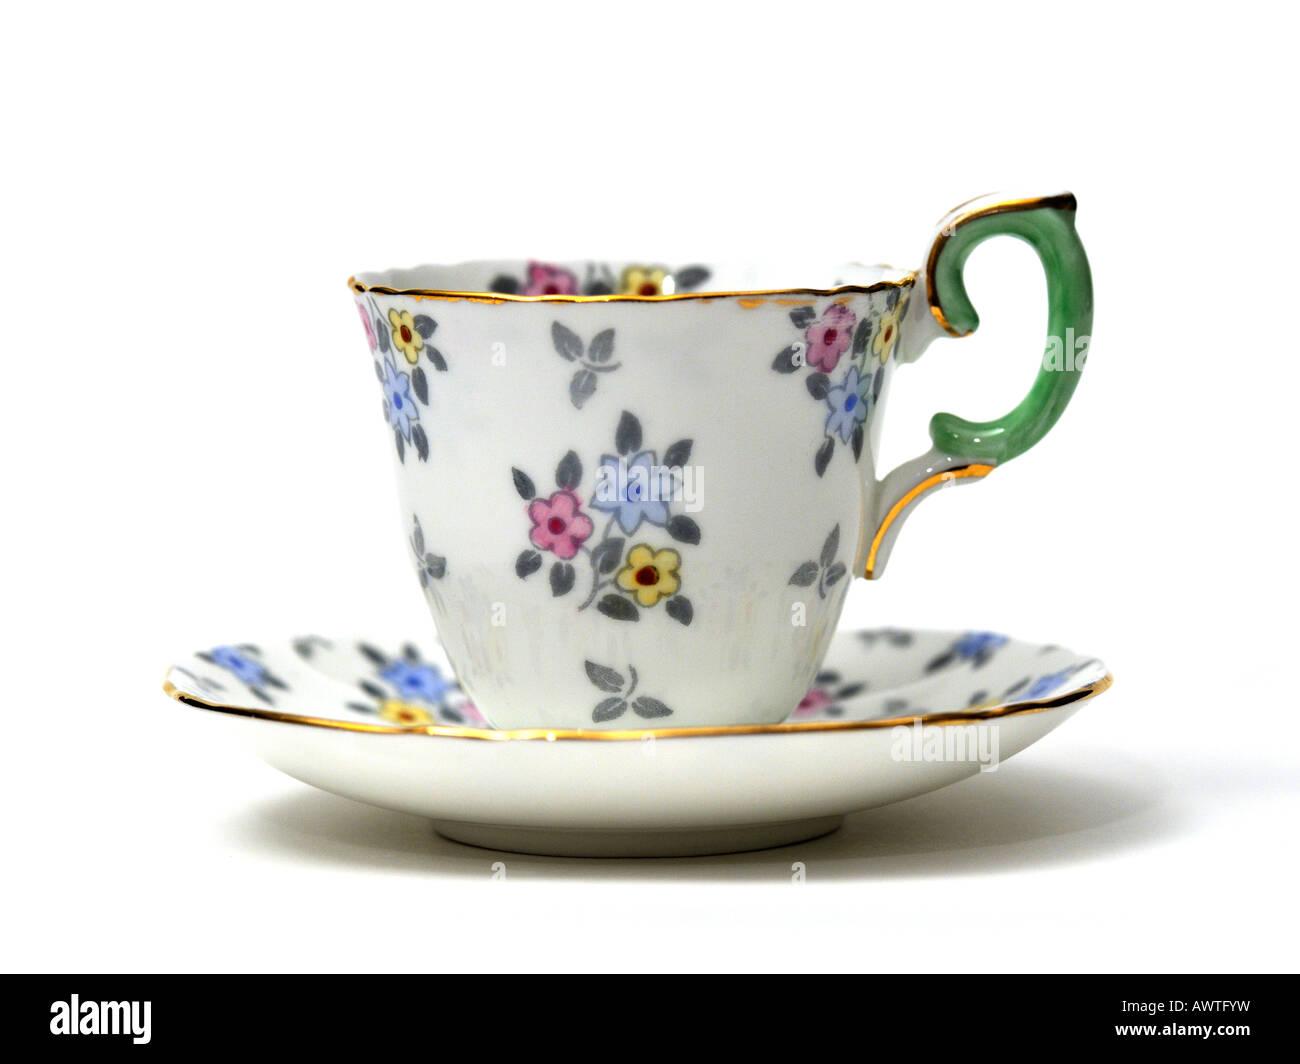 fine english bone china porcelain english ceramics coffee tea cup stock photo 16651260 alamy. Black Bedroom Furniture Sets. Home Design Ideas